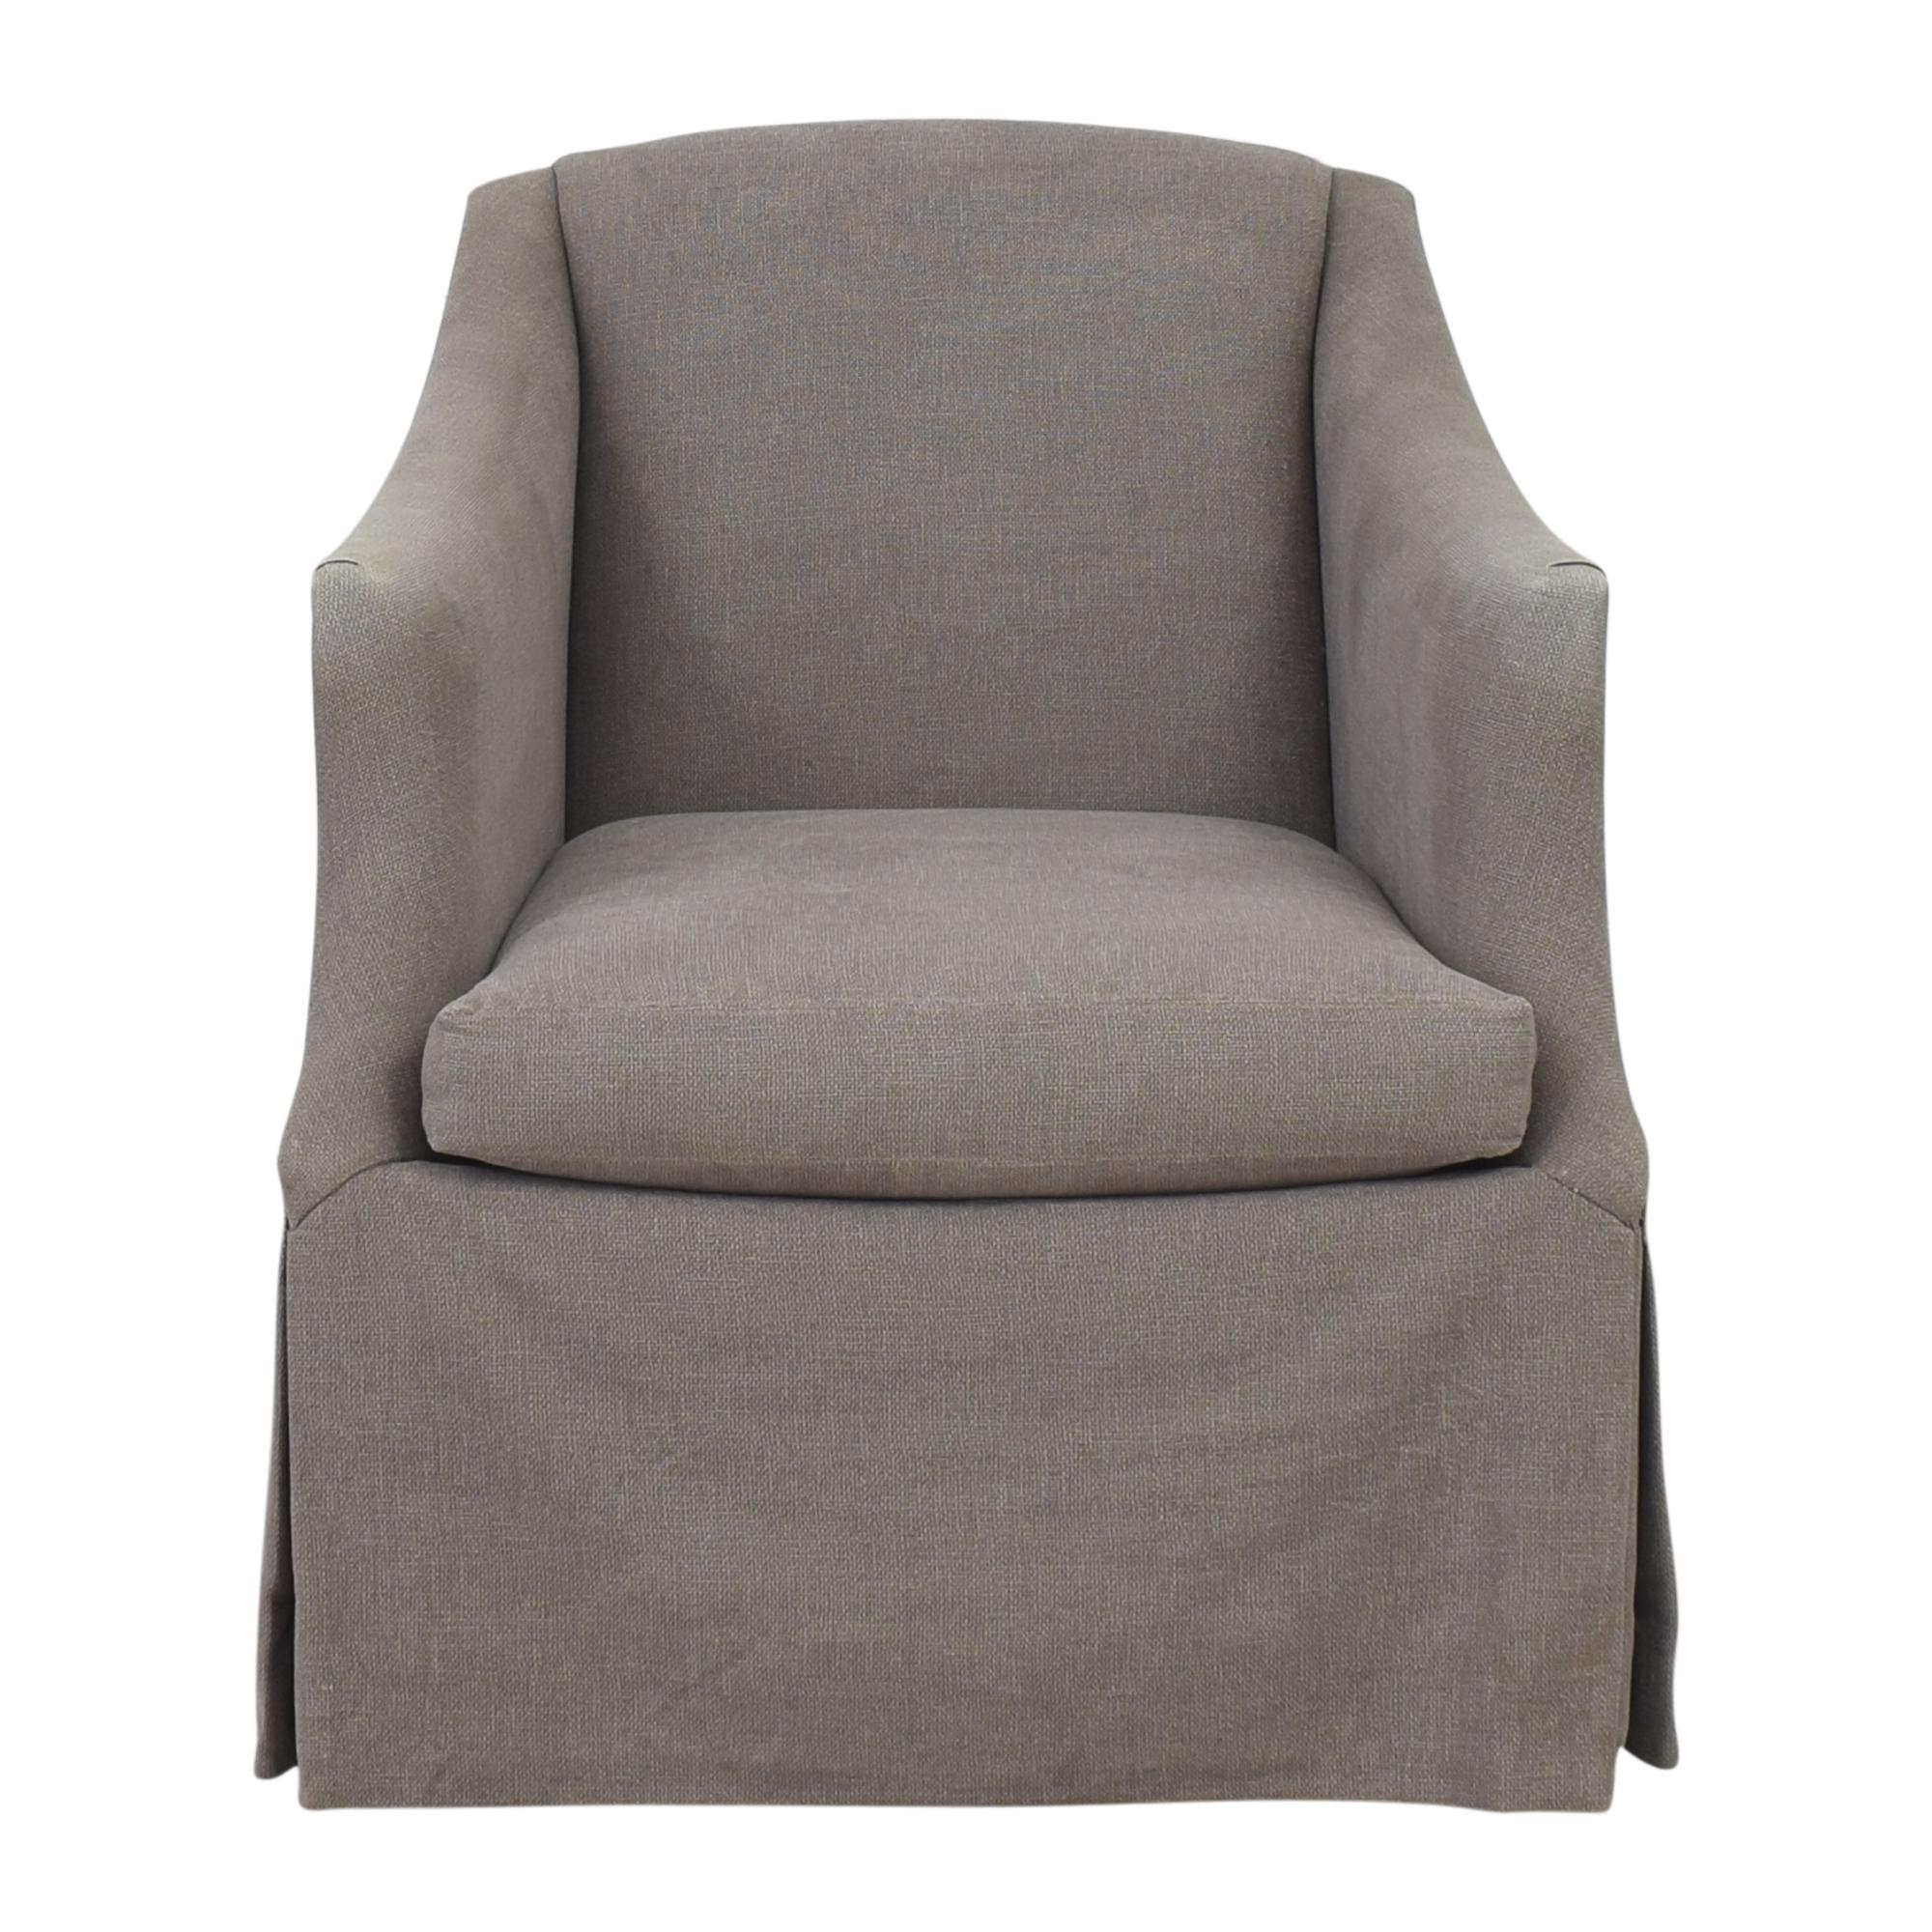 Safavieh Safavieh Sandra Slipcover Chair for sale